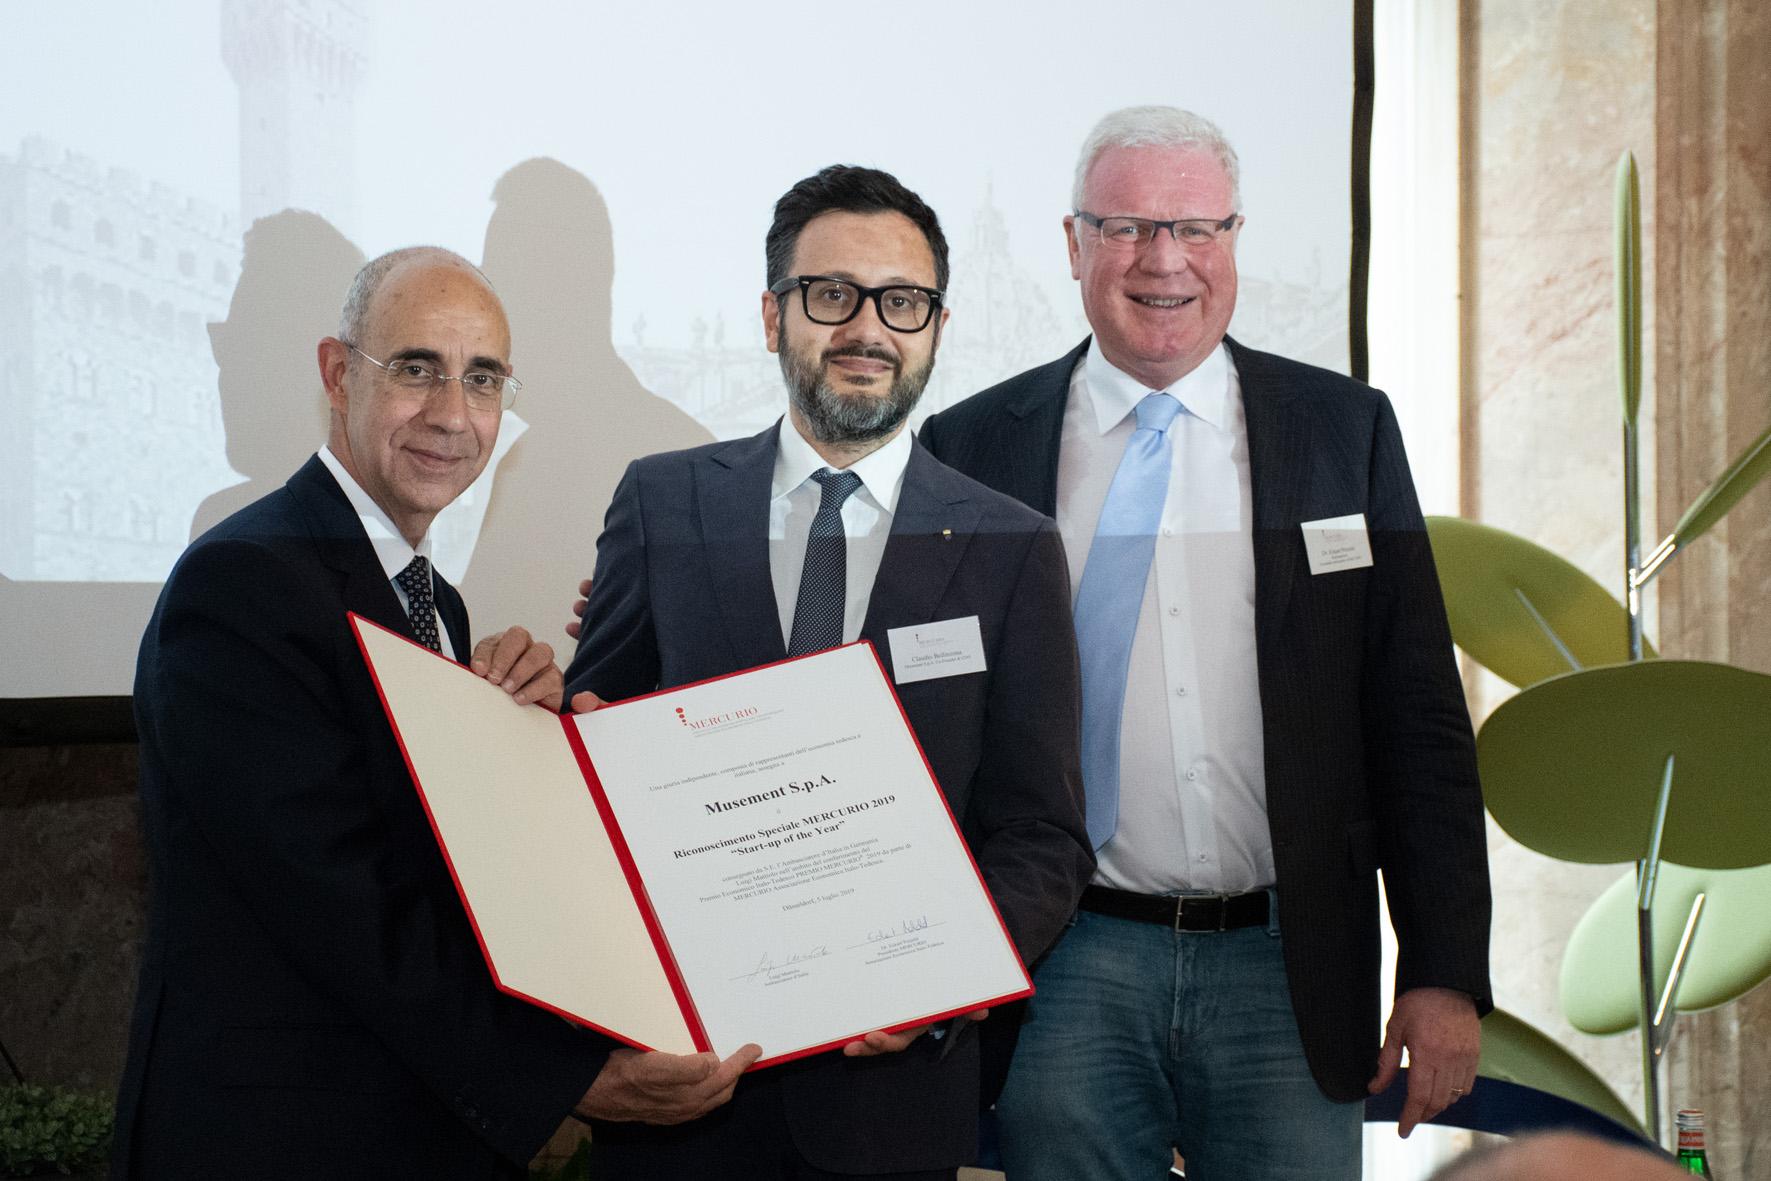 S.E. Luigi Mattiolo, Claudio Bellinzona (Musement), Dr. Eckart Petzold (MERCURIO)